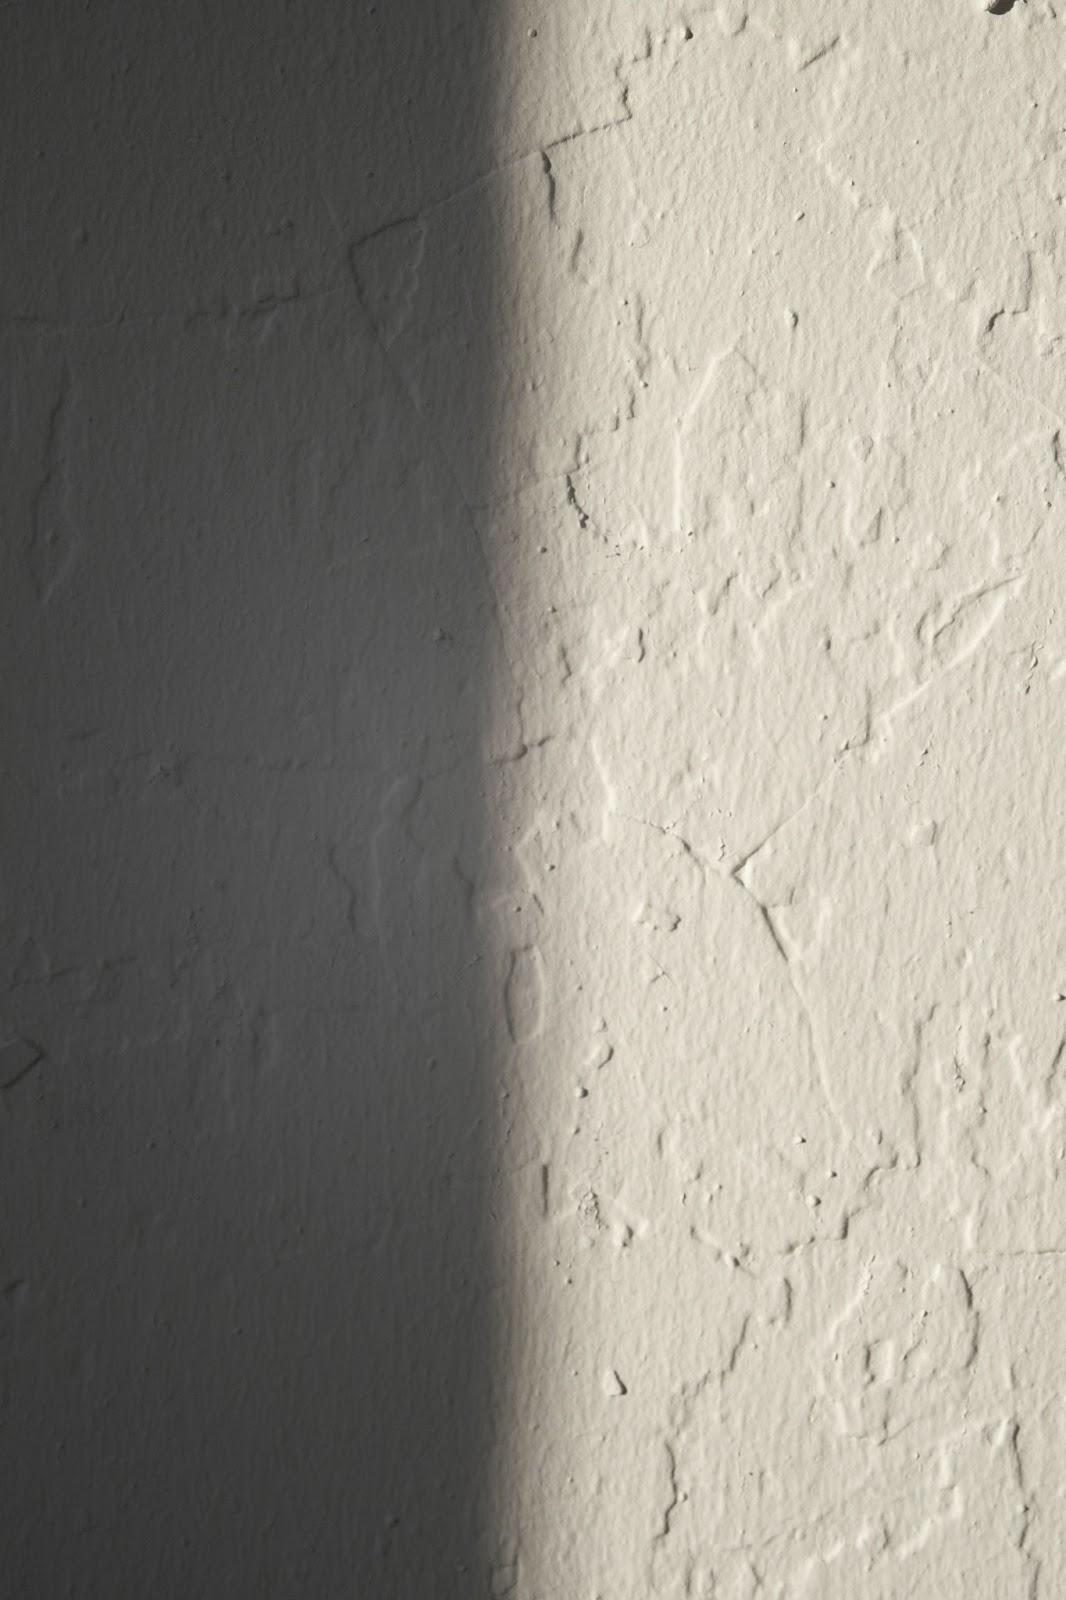 When Should You Waterproof Your Stucco Walls